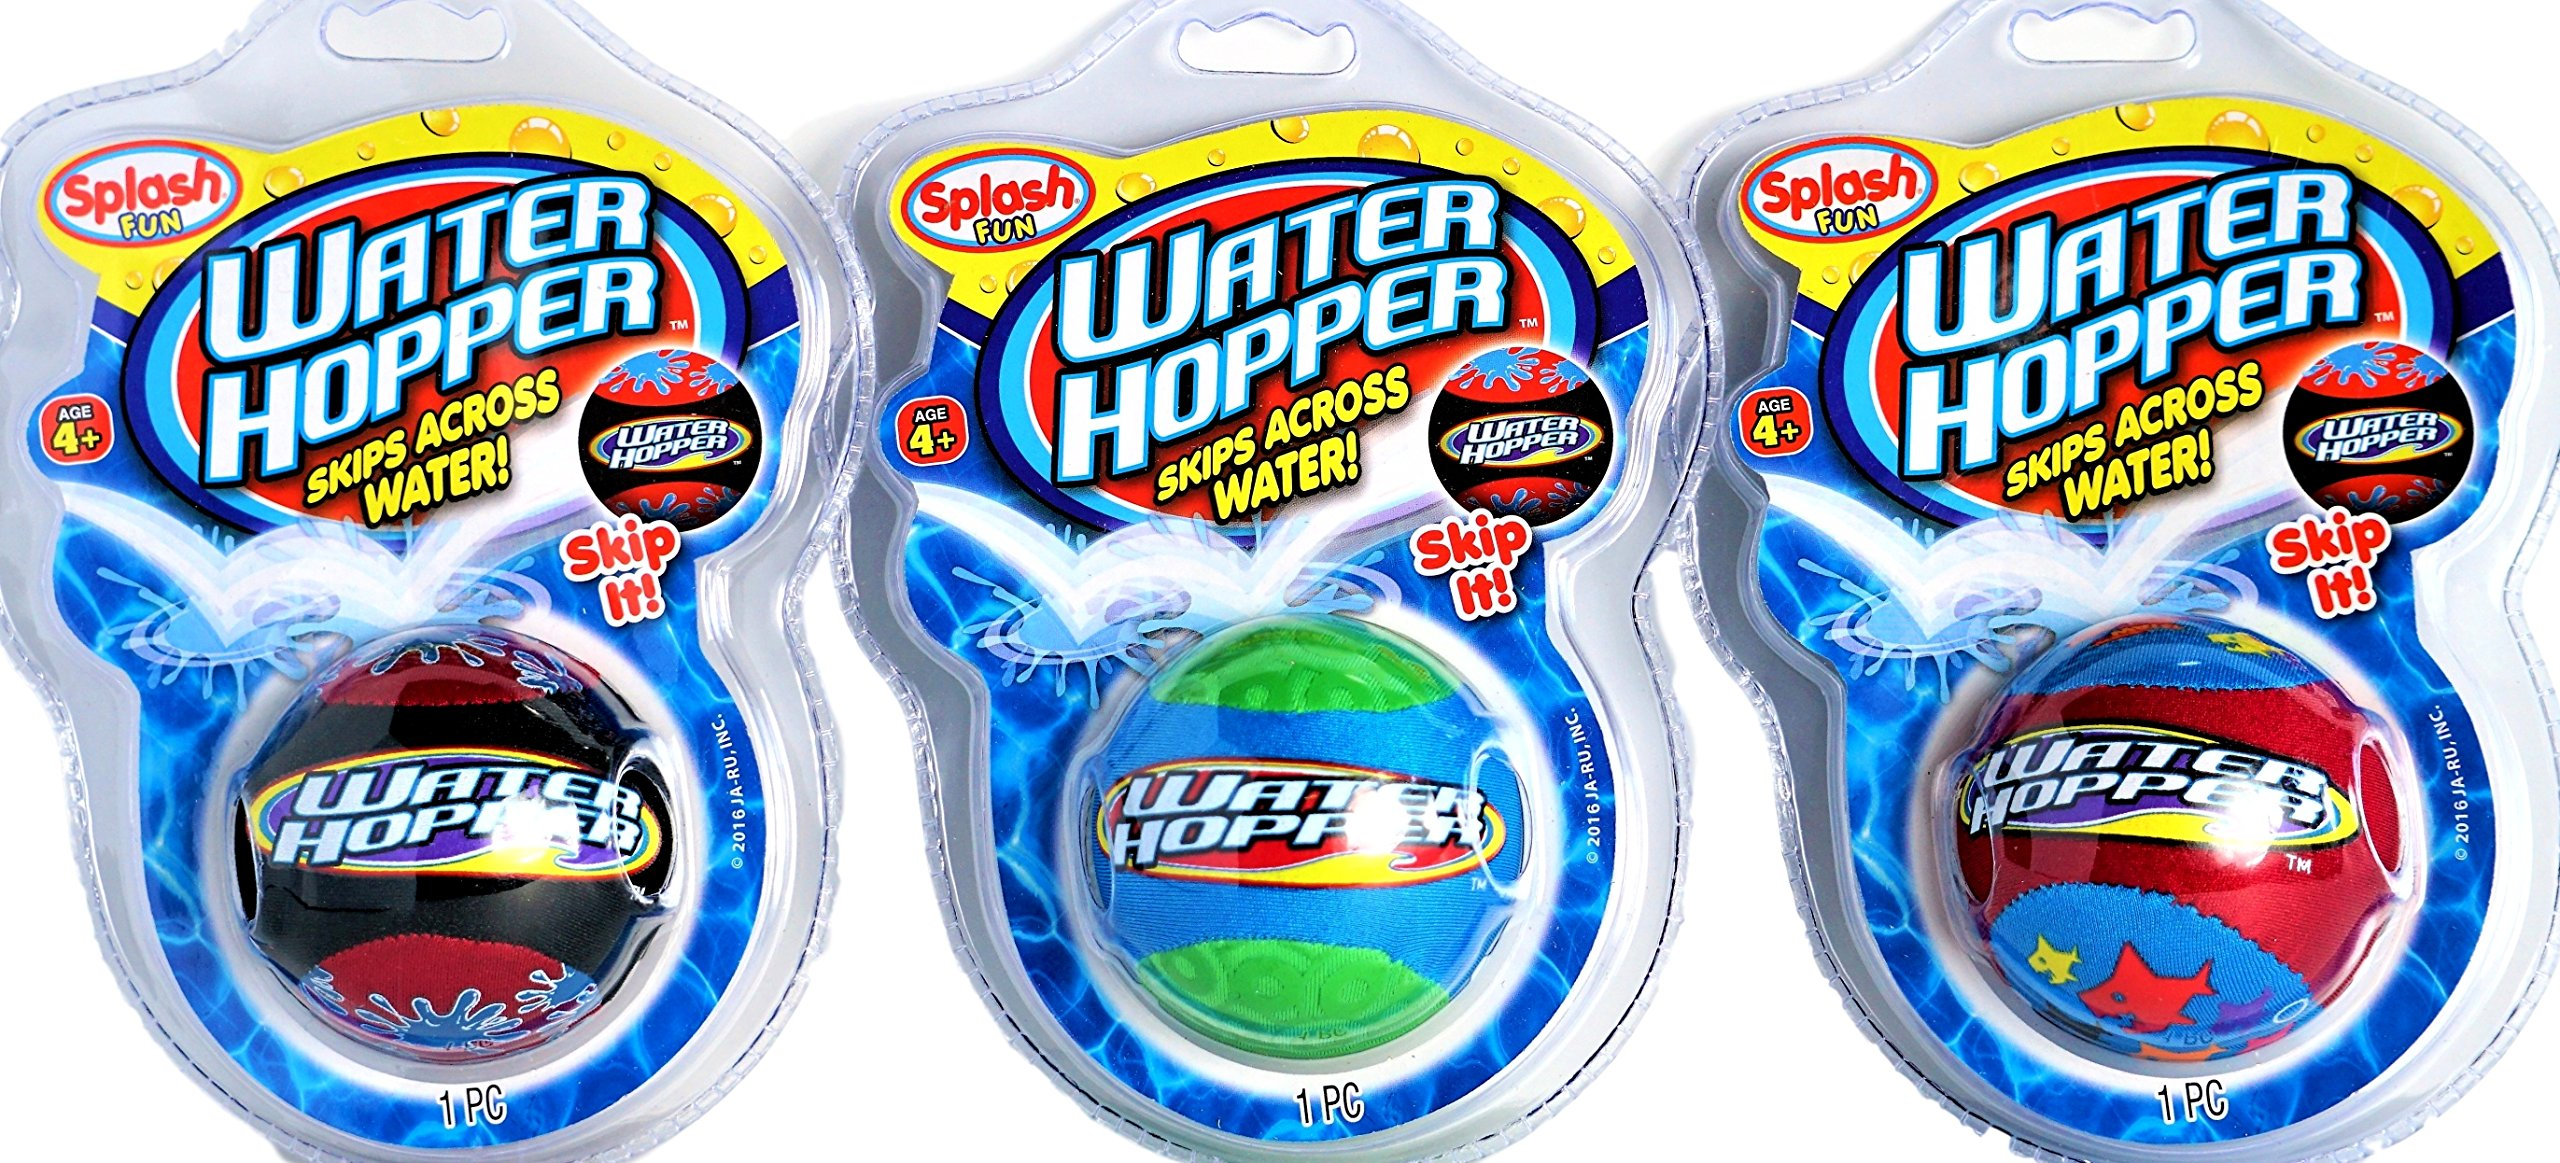 JA-RU Pro Water Hopper Skip it Bouncing Ball (Pack of 72 Units) Bounce & Skips | Item #880-72 by JA-RU (Image #2)